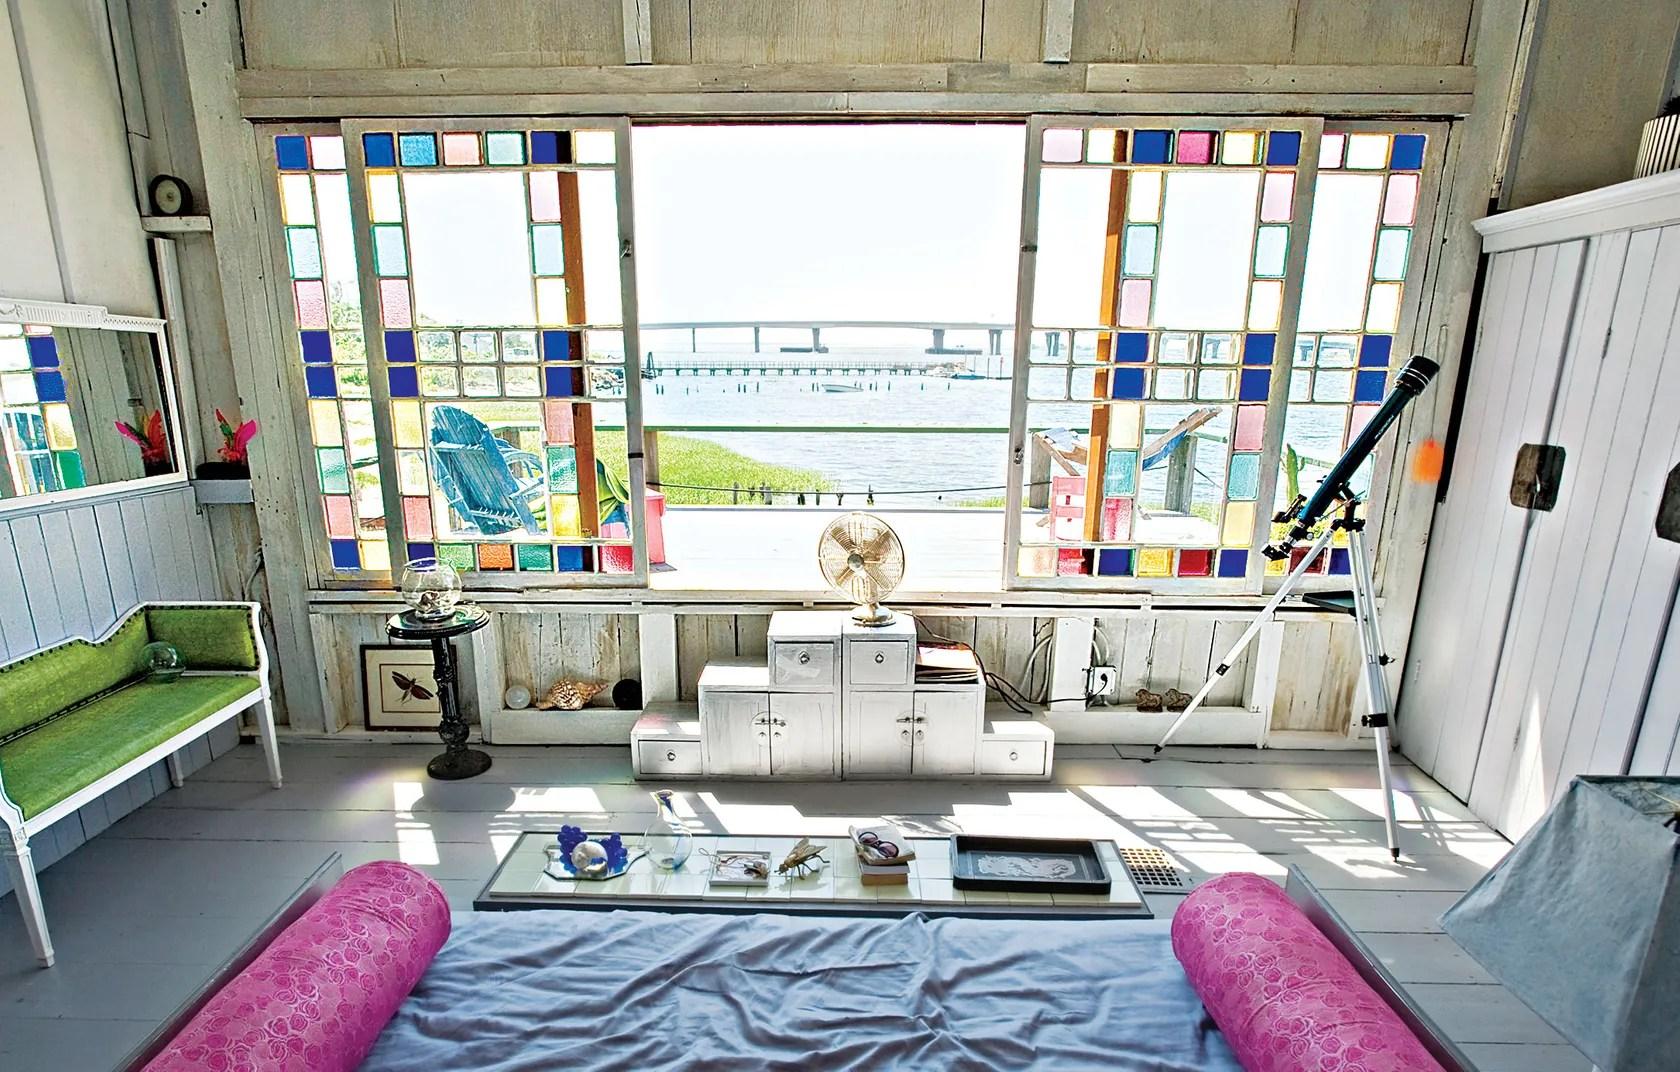 jamaica bay windows